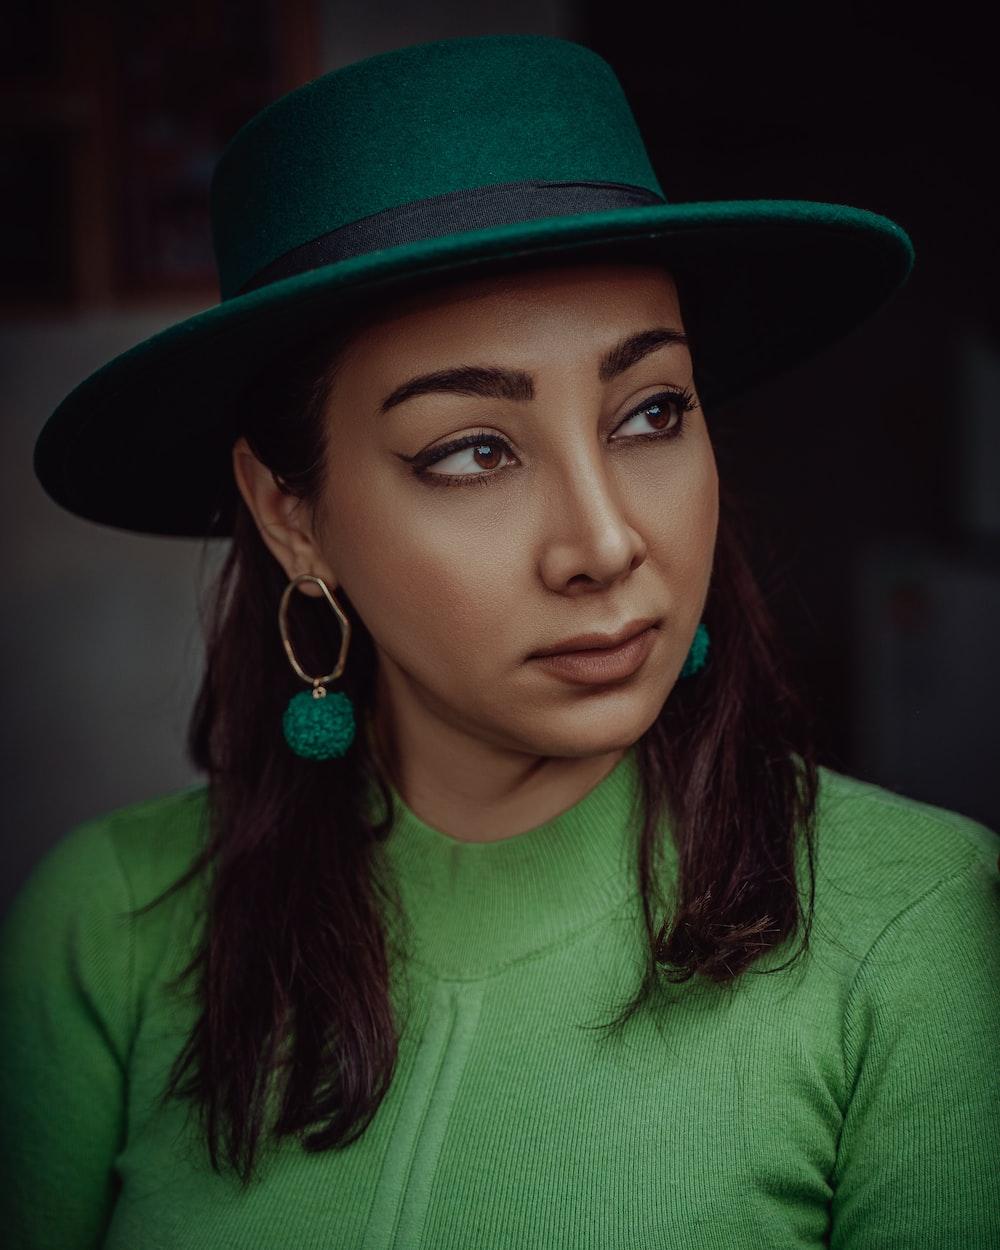 woman in green shirt wearing brown fedora hat